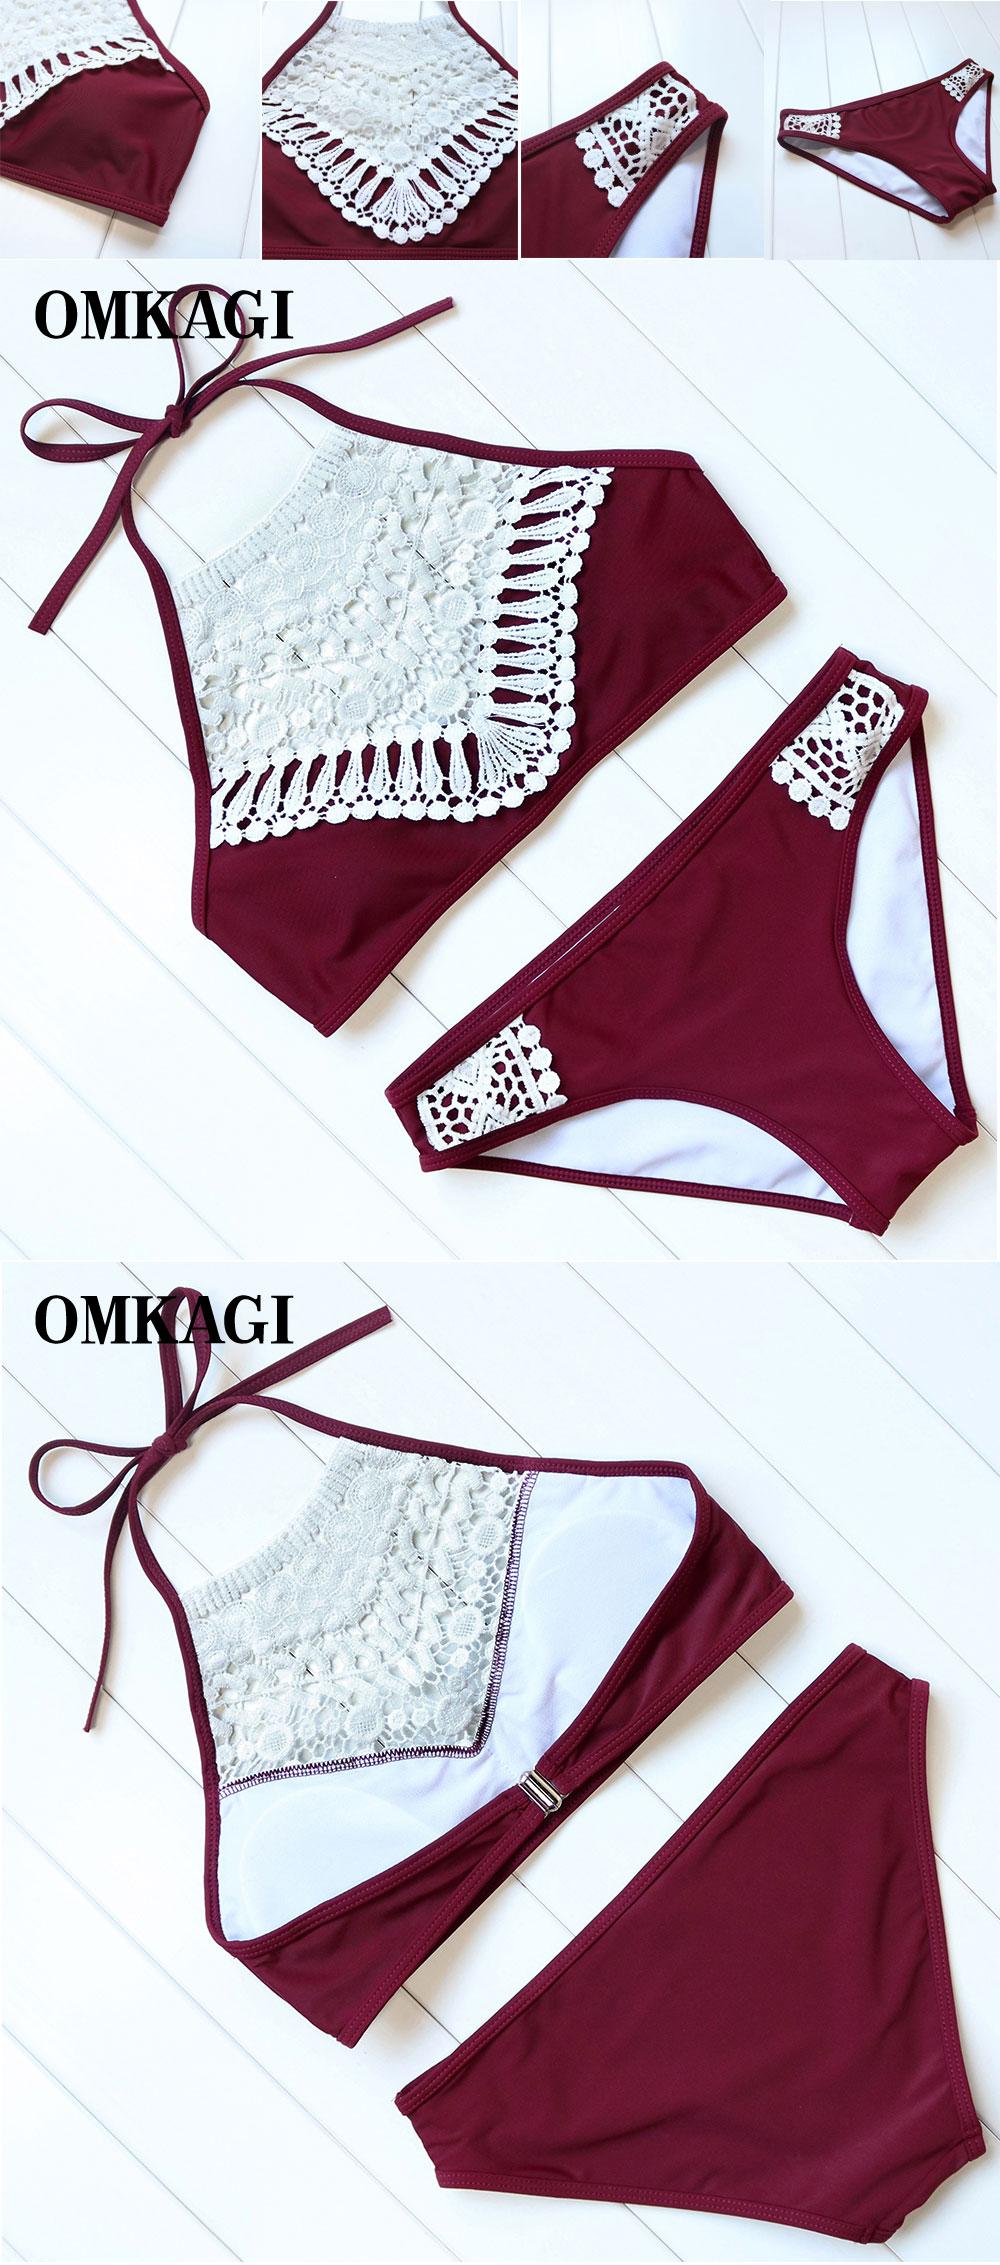 OMKAGI Swimwear Women Bikini Lace Patchwork Swimsuits Push-Up Low Waist Neck Bandage Bikini Set Bodysuits Beachwear Biquini 7